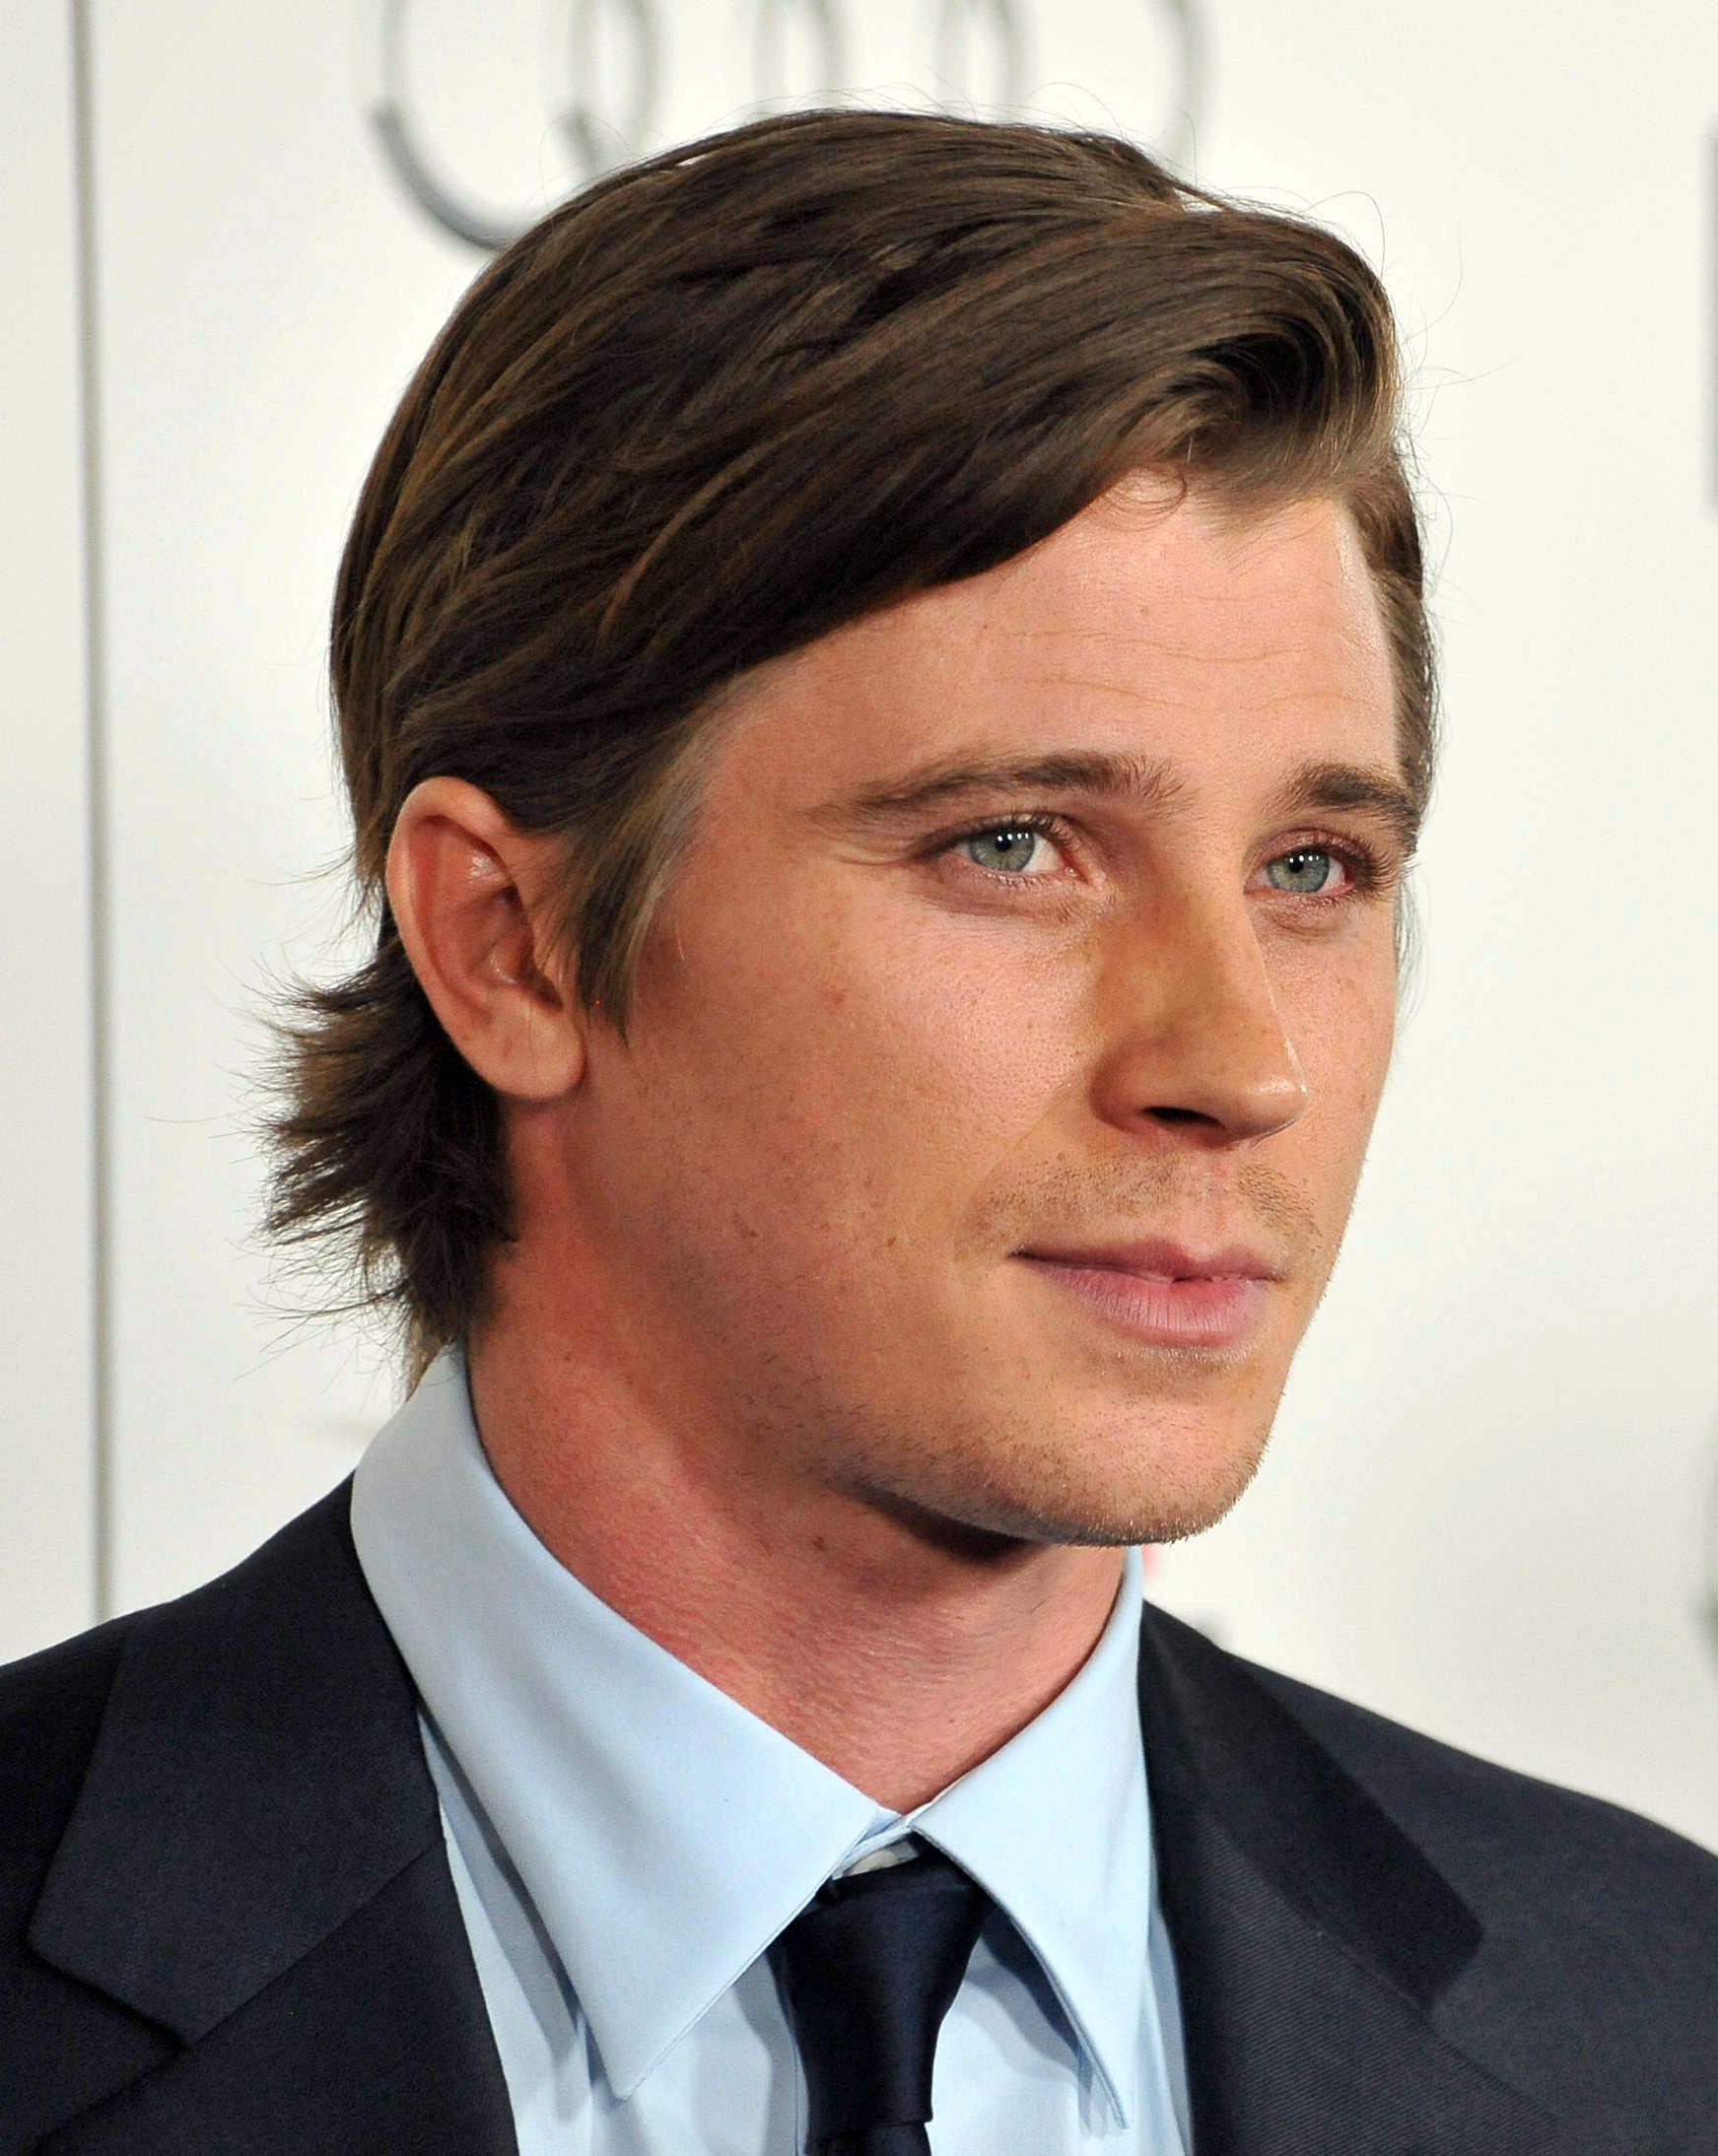 Garrett Hedlund's Ear Tucked Hairstyle